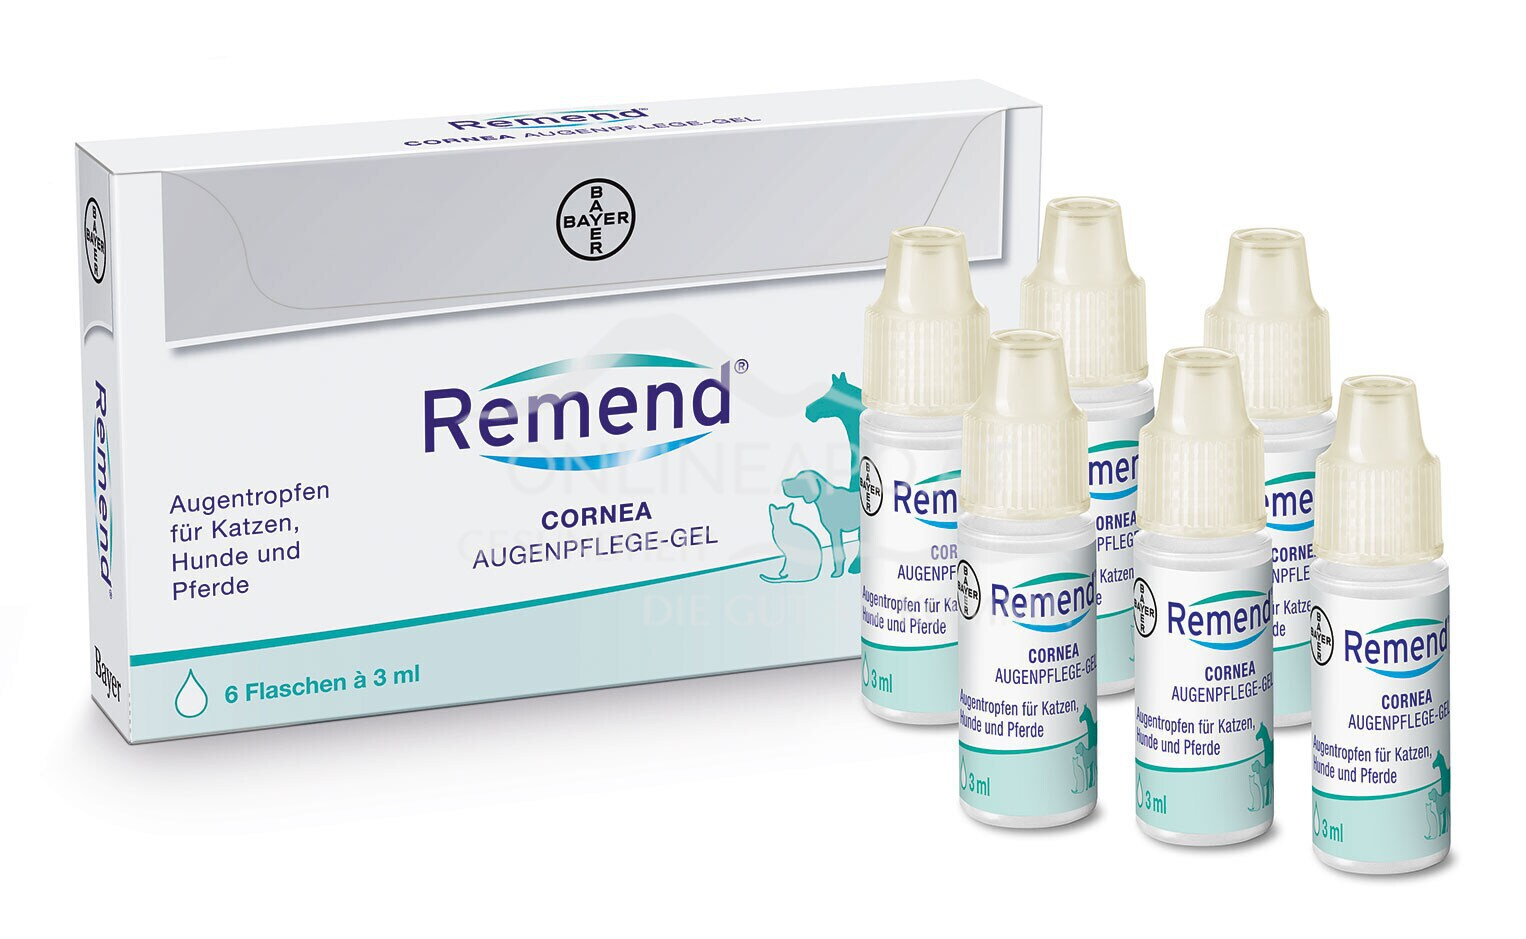 Remend® Cornea Augenpflege-Gel 6x3ml